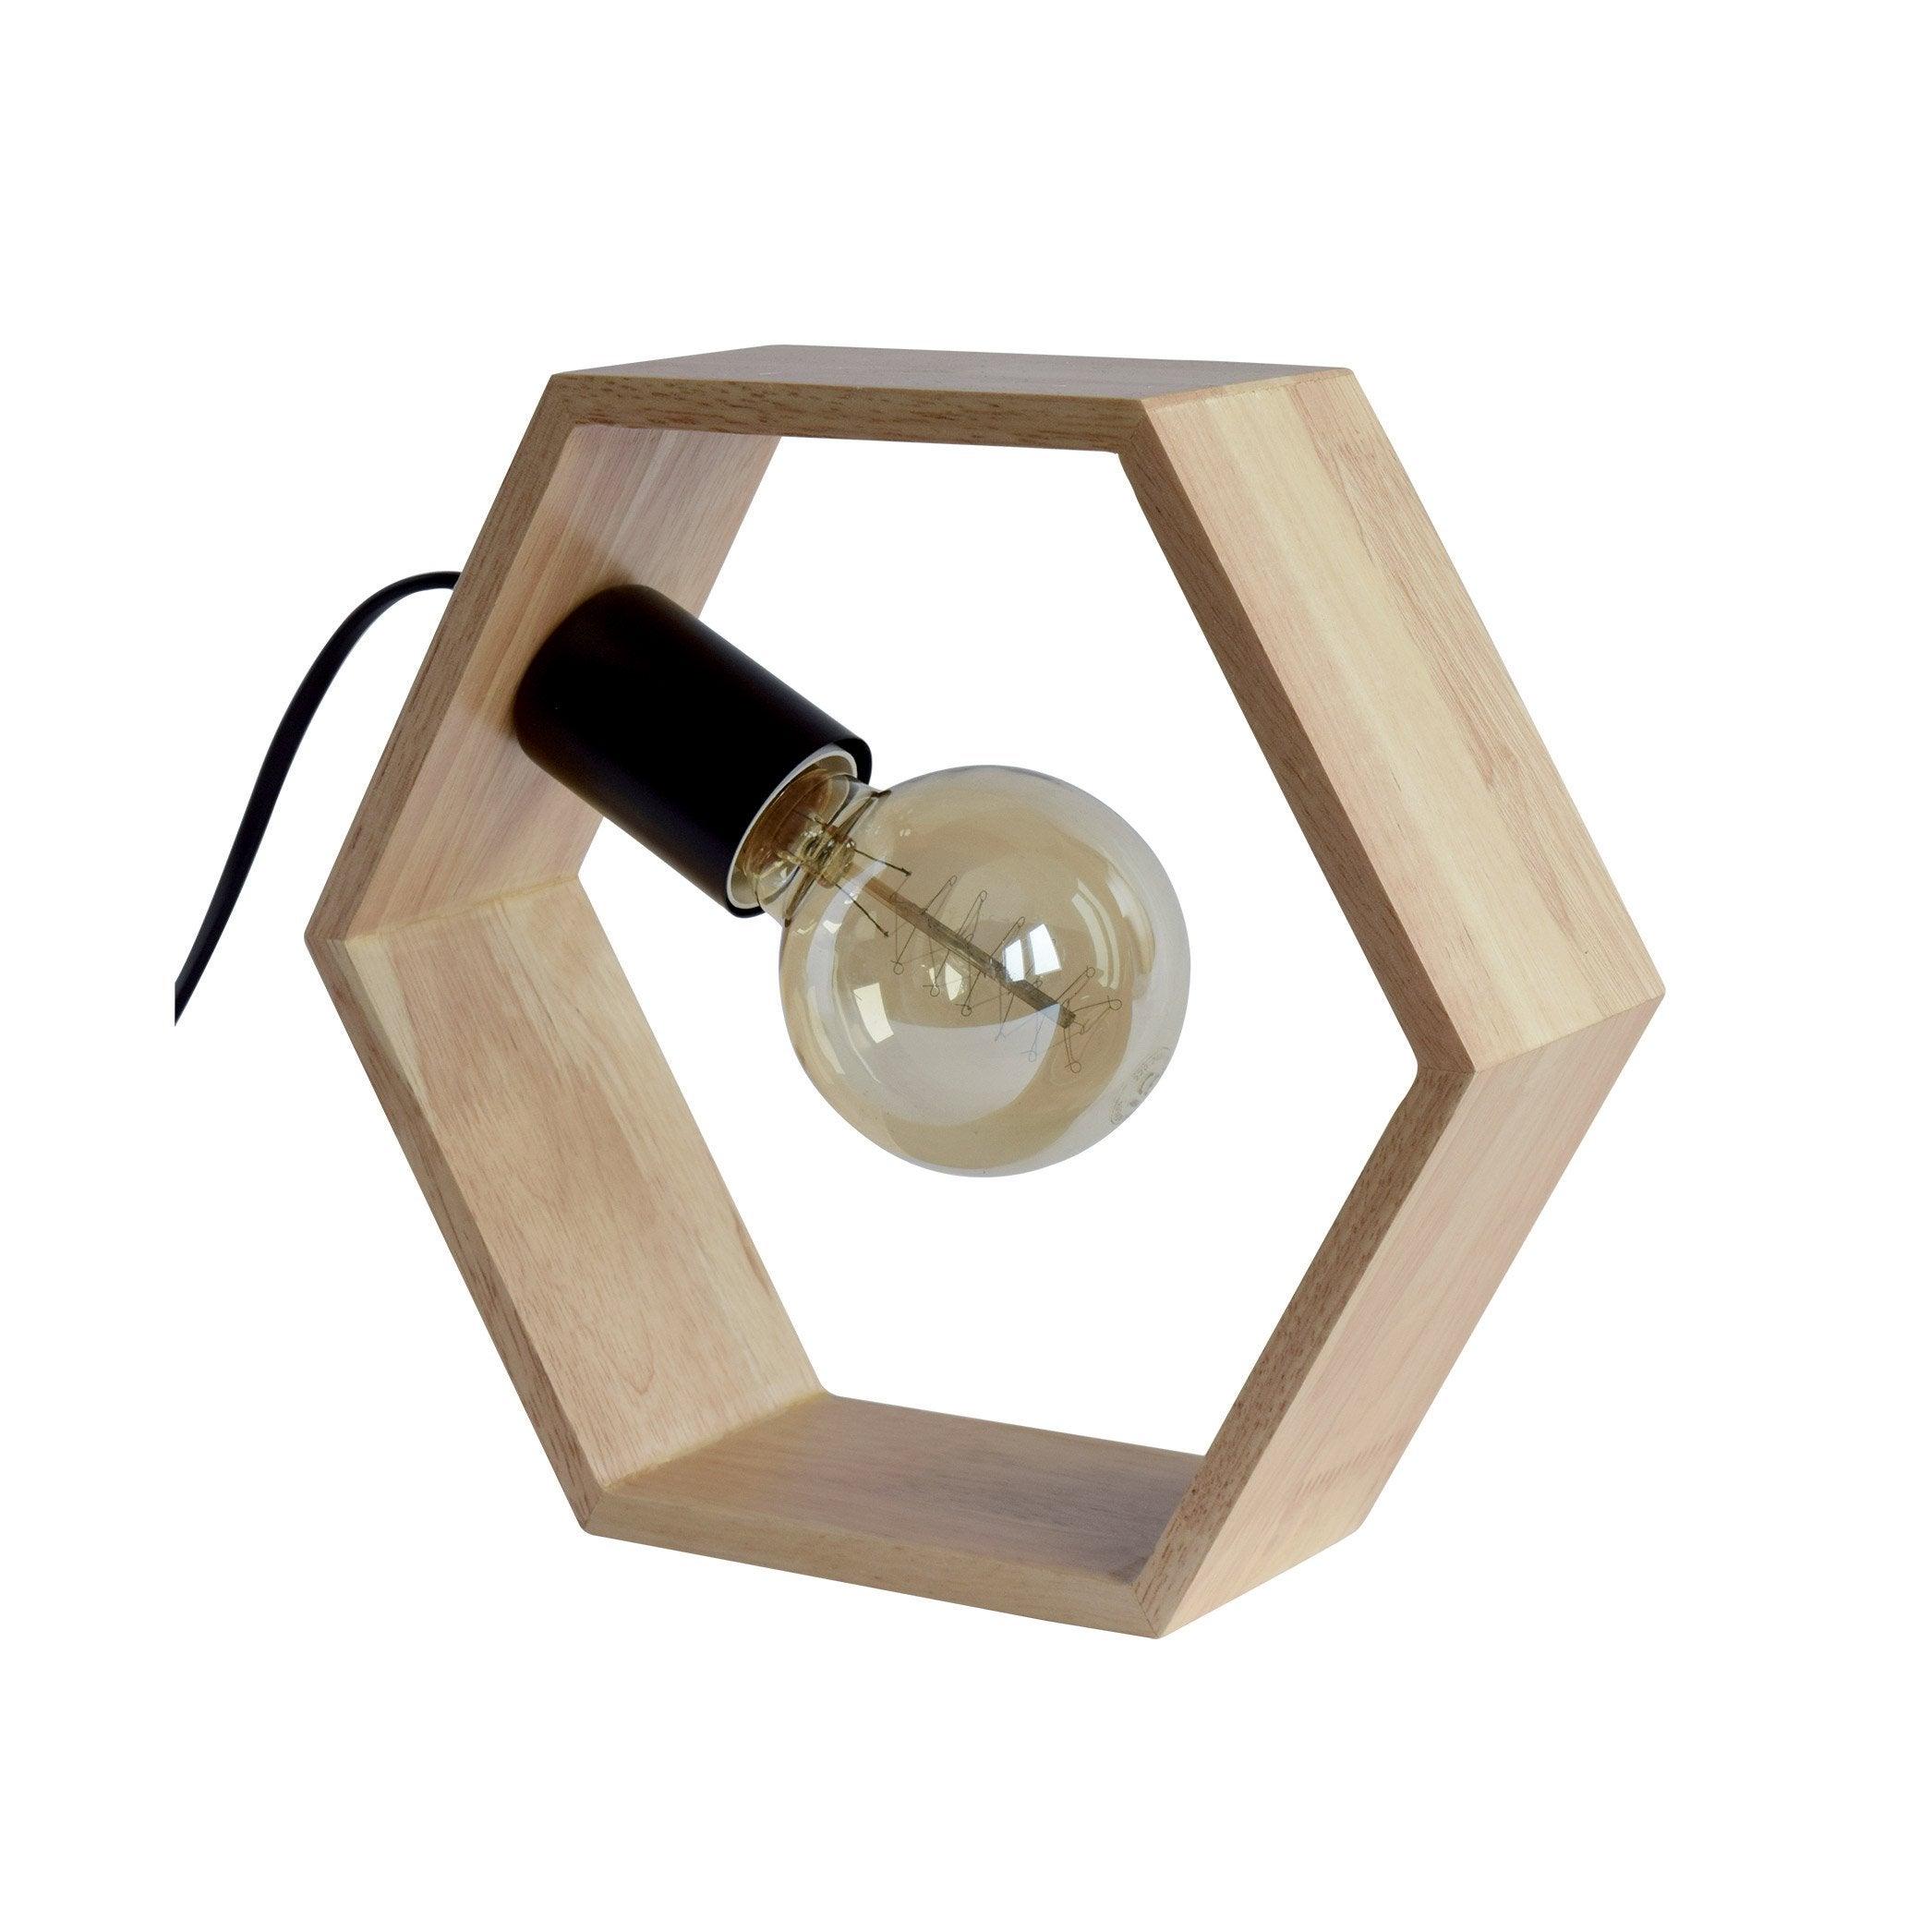 ClairSeynave Hexagonale Chêne Factory LampeScandinaveBois Yb7v6gyf